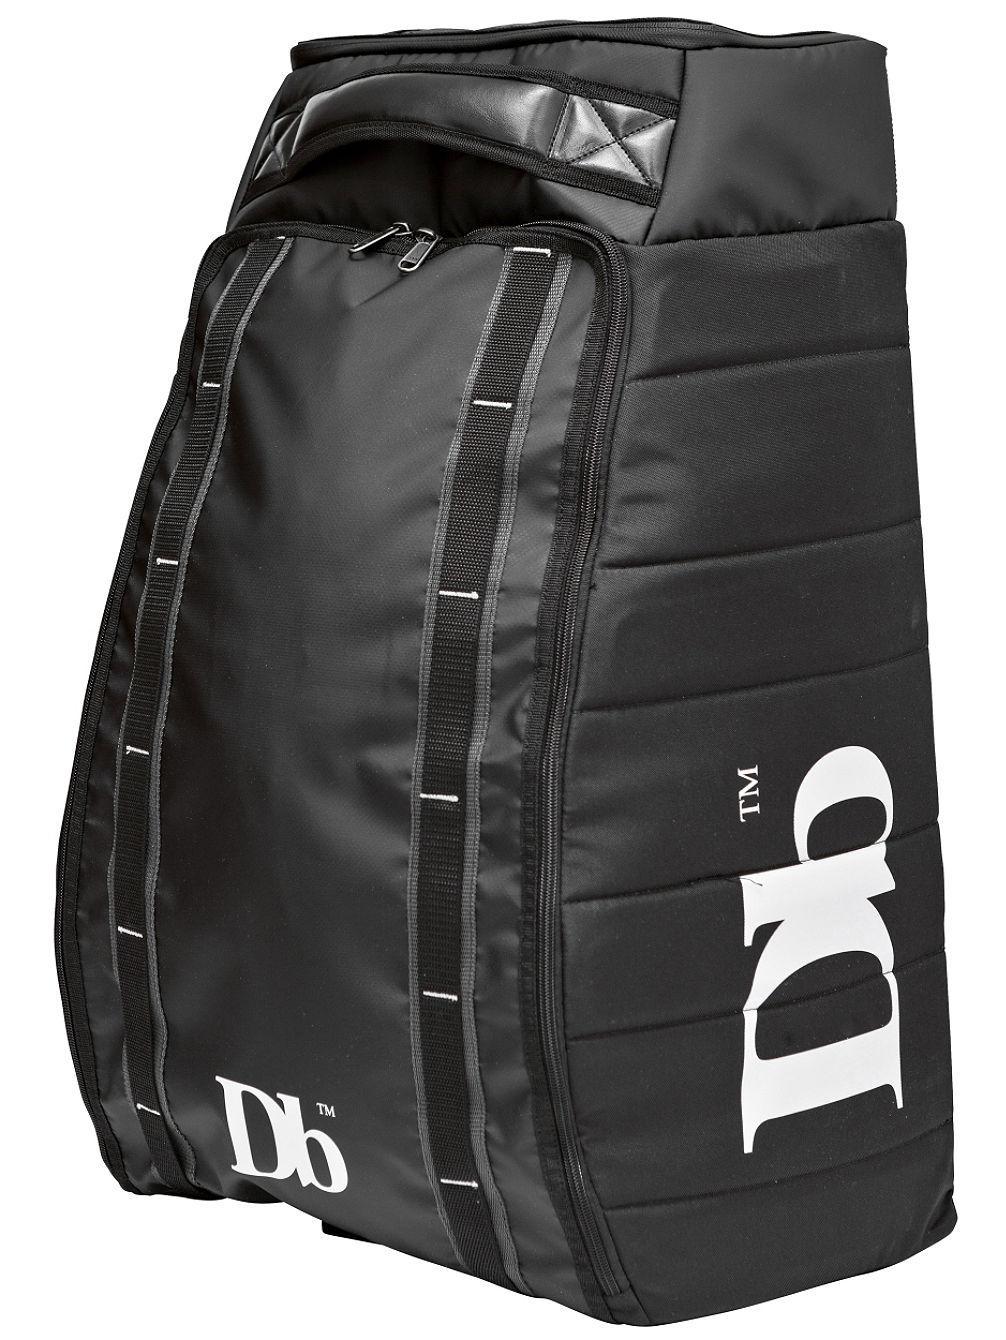 douchebags the hugger 60l reisetasche online kaufen bei blue. Black Bedroom Furniture Sets. Home Design Ideas